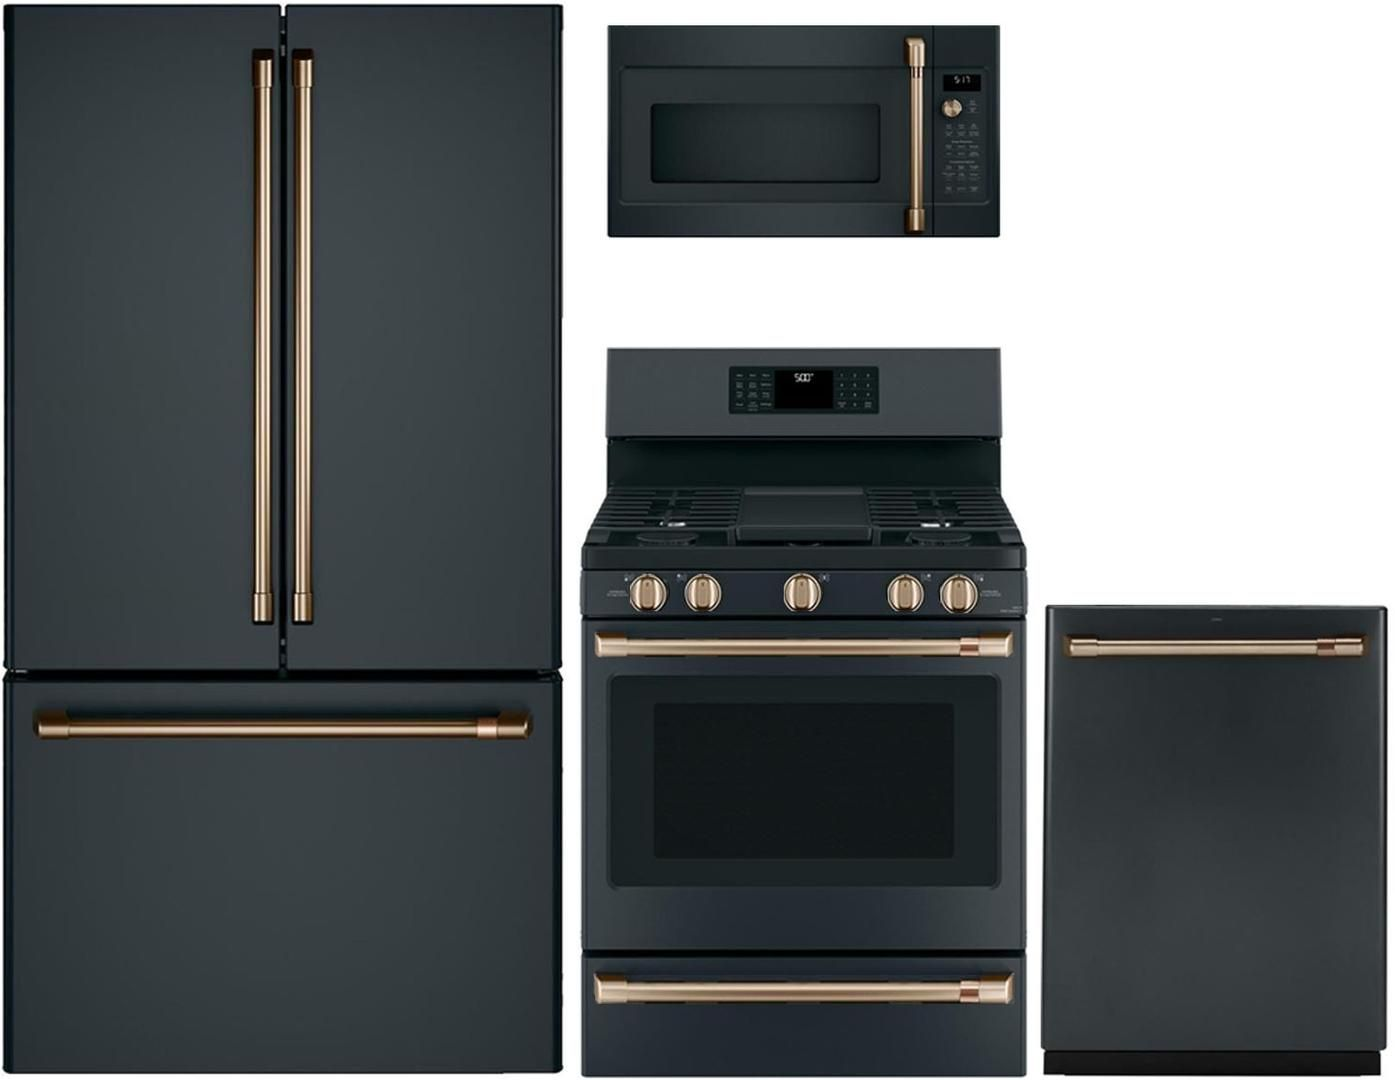 Cafe 962453 2 873 00 In 2020 Kitchen Appliance Packages Black Appliances Kitchen Built In Dishwasher